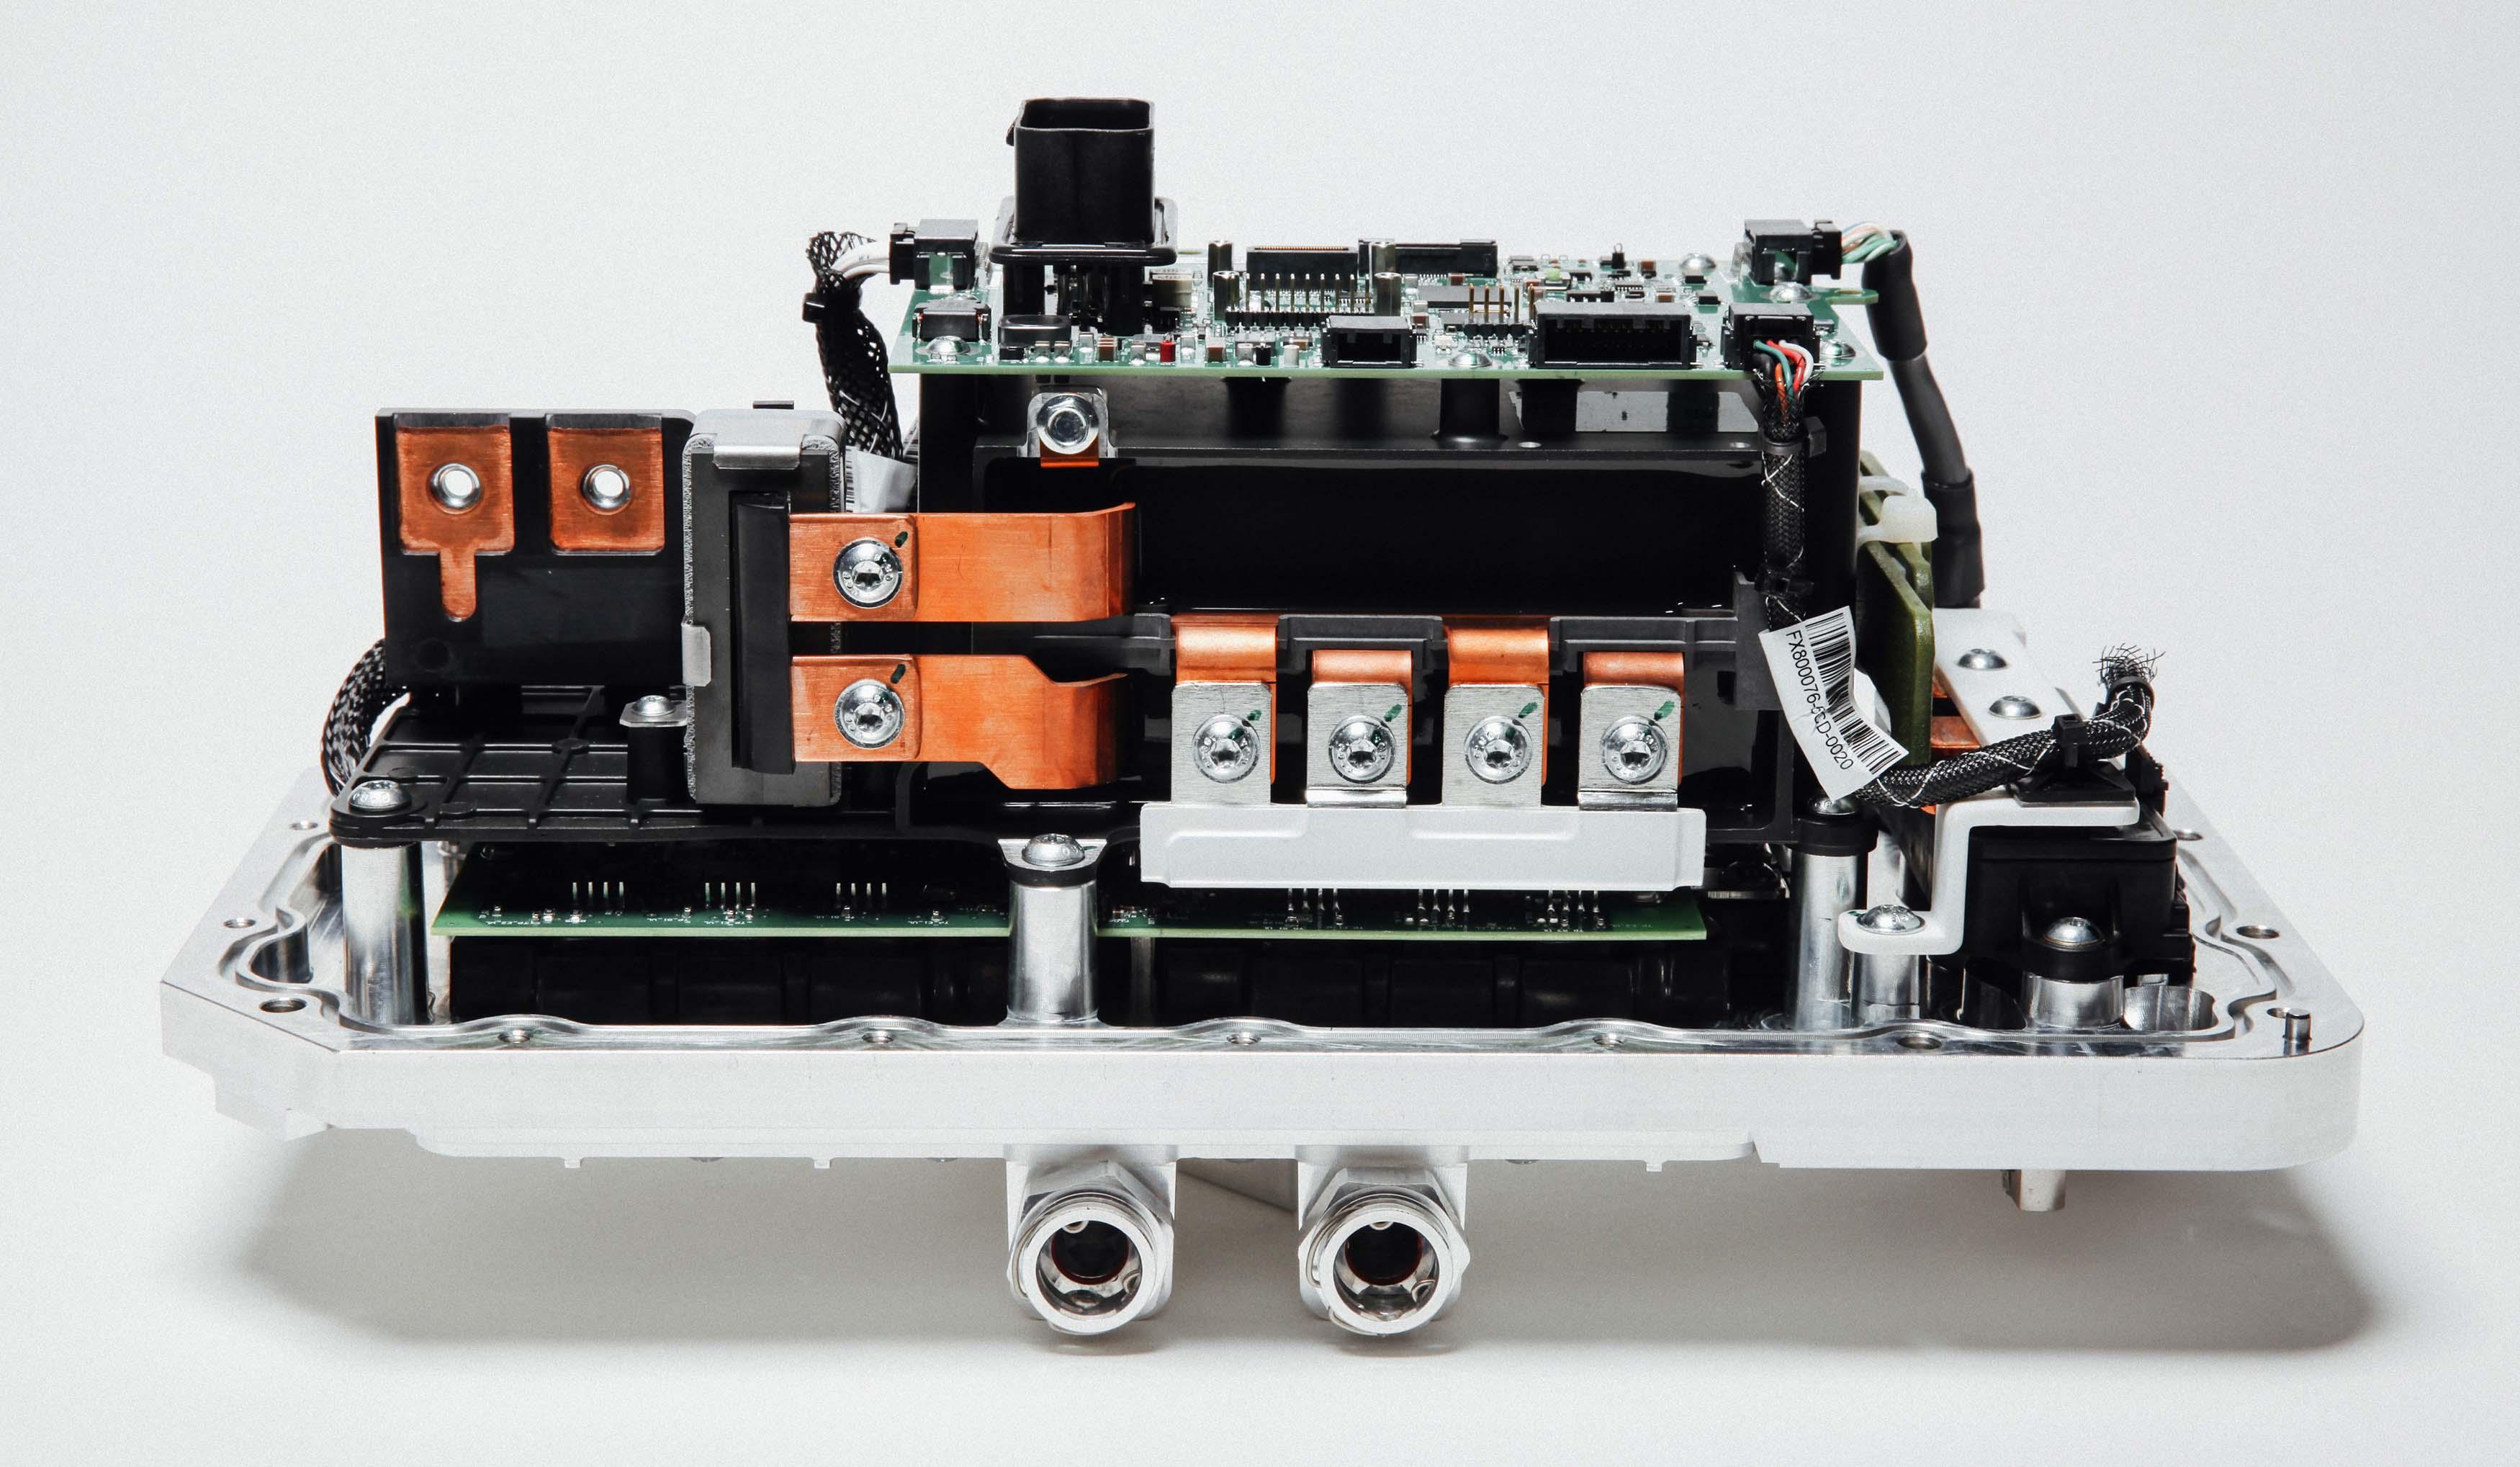 FF Echelon Inverter Faraday Future